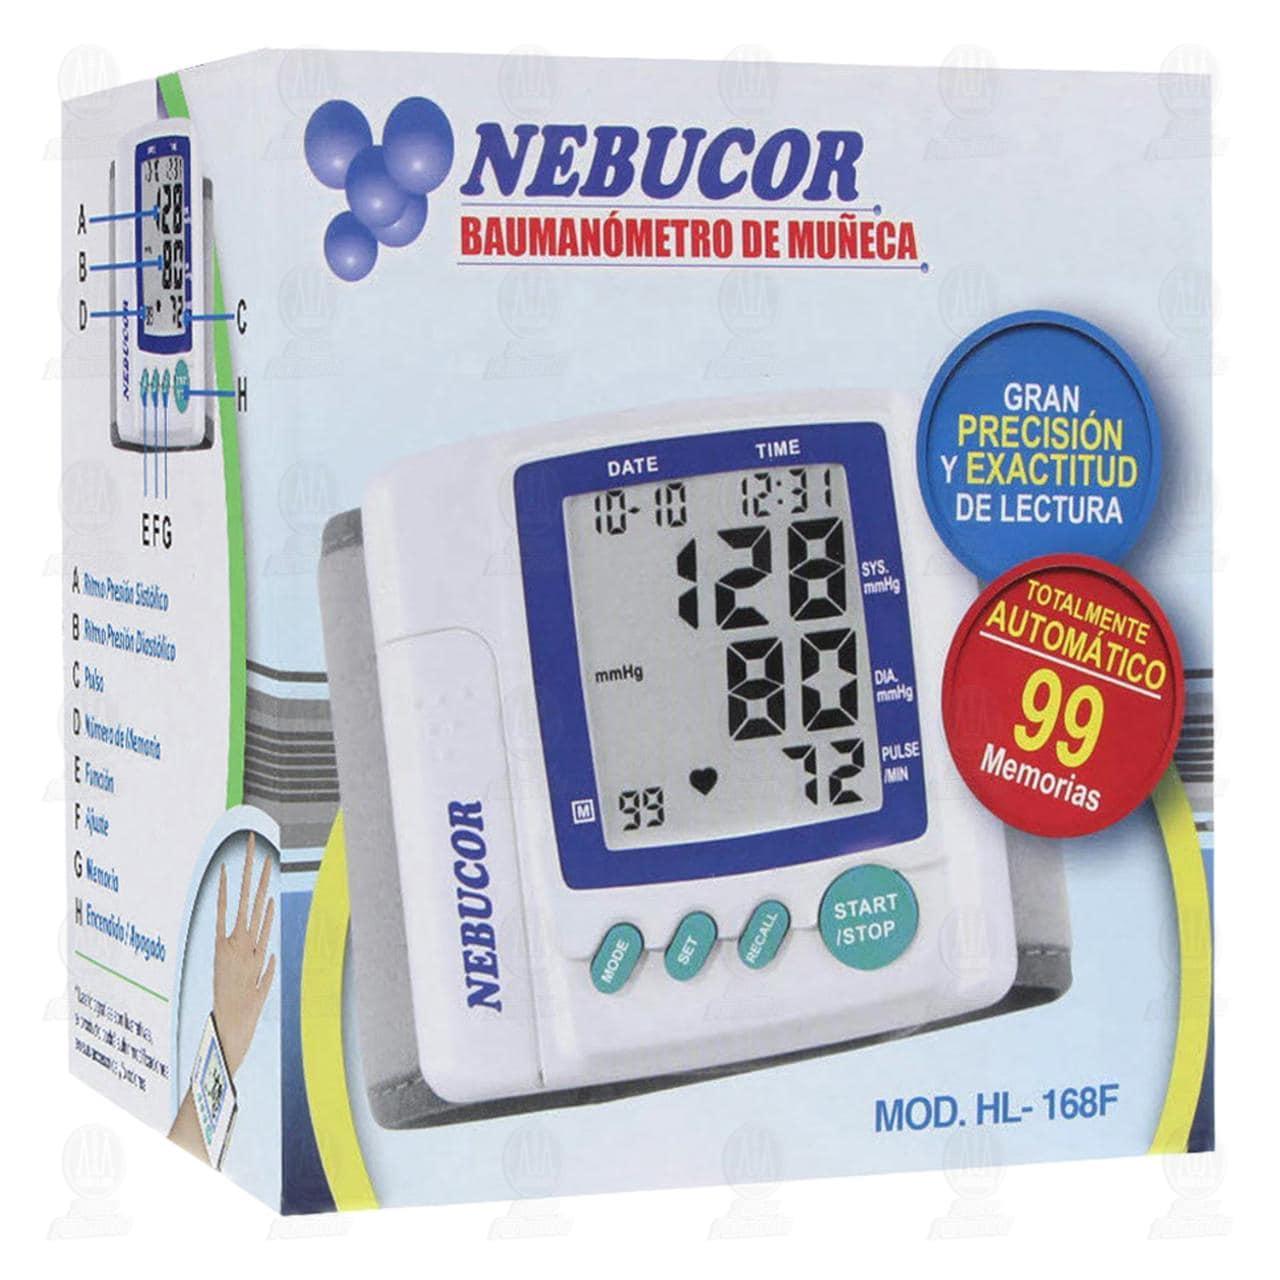 Baumanómetro Nebucor Hl168f Mano